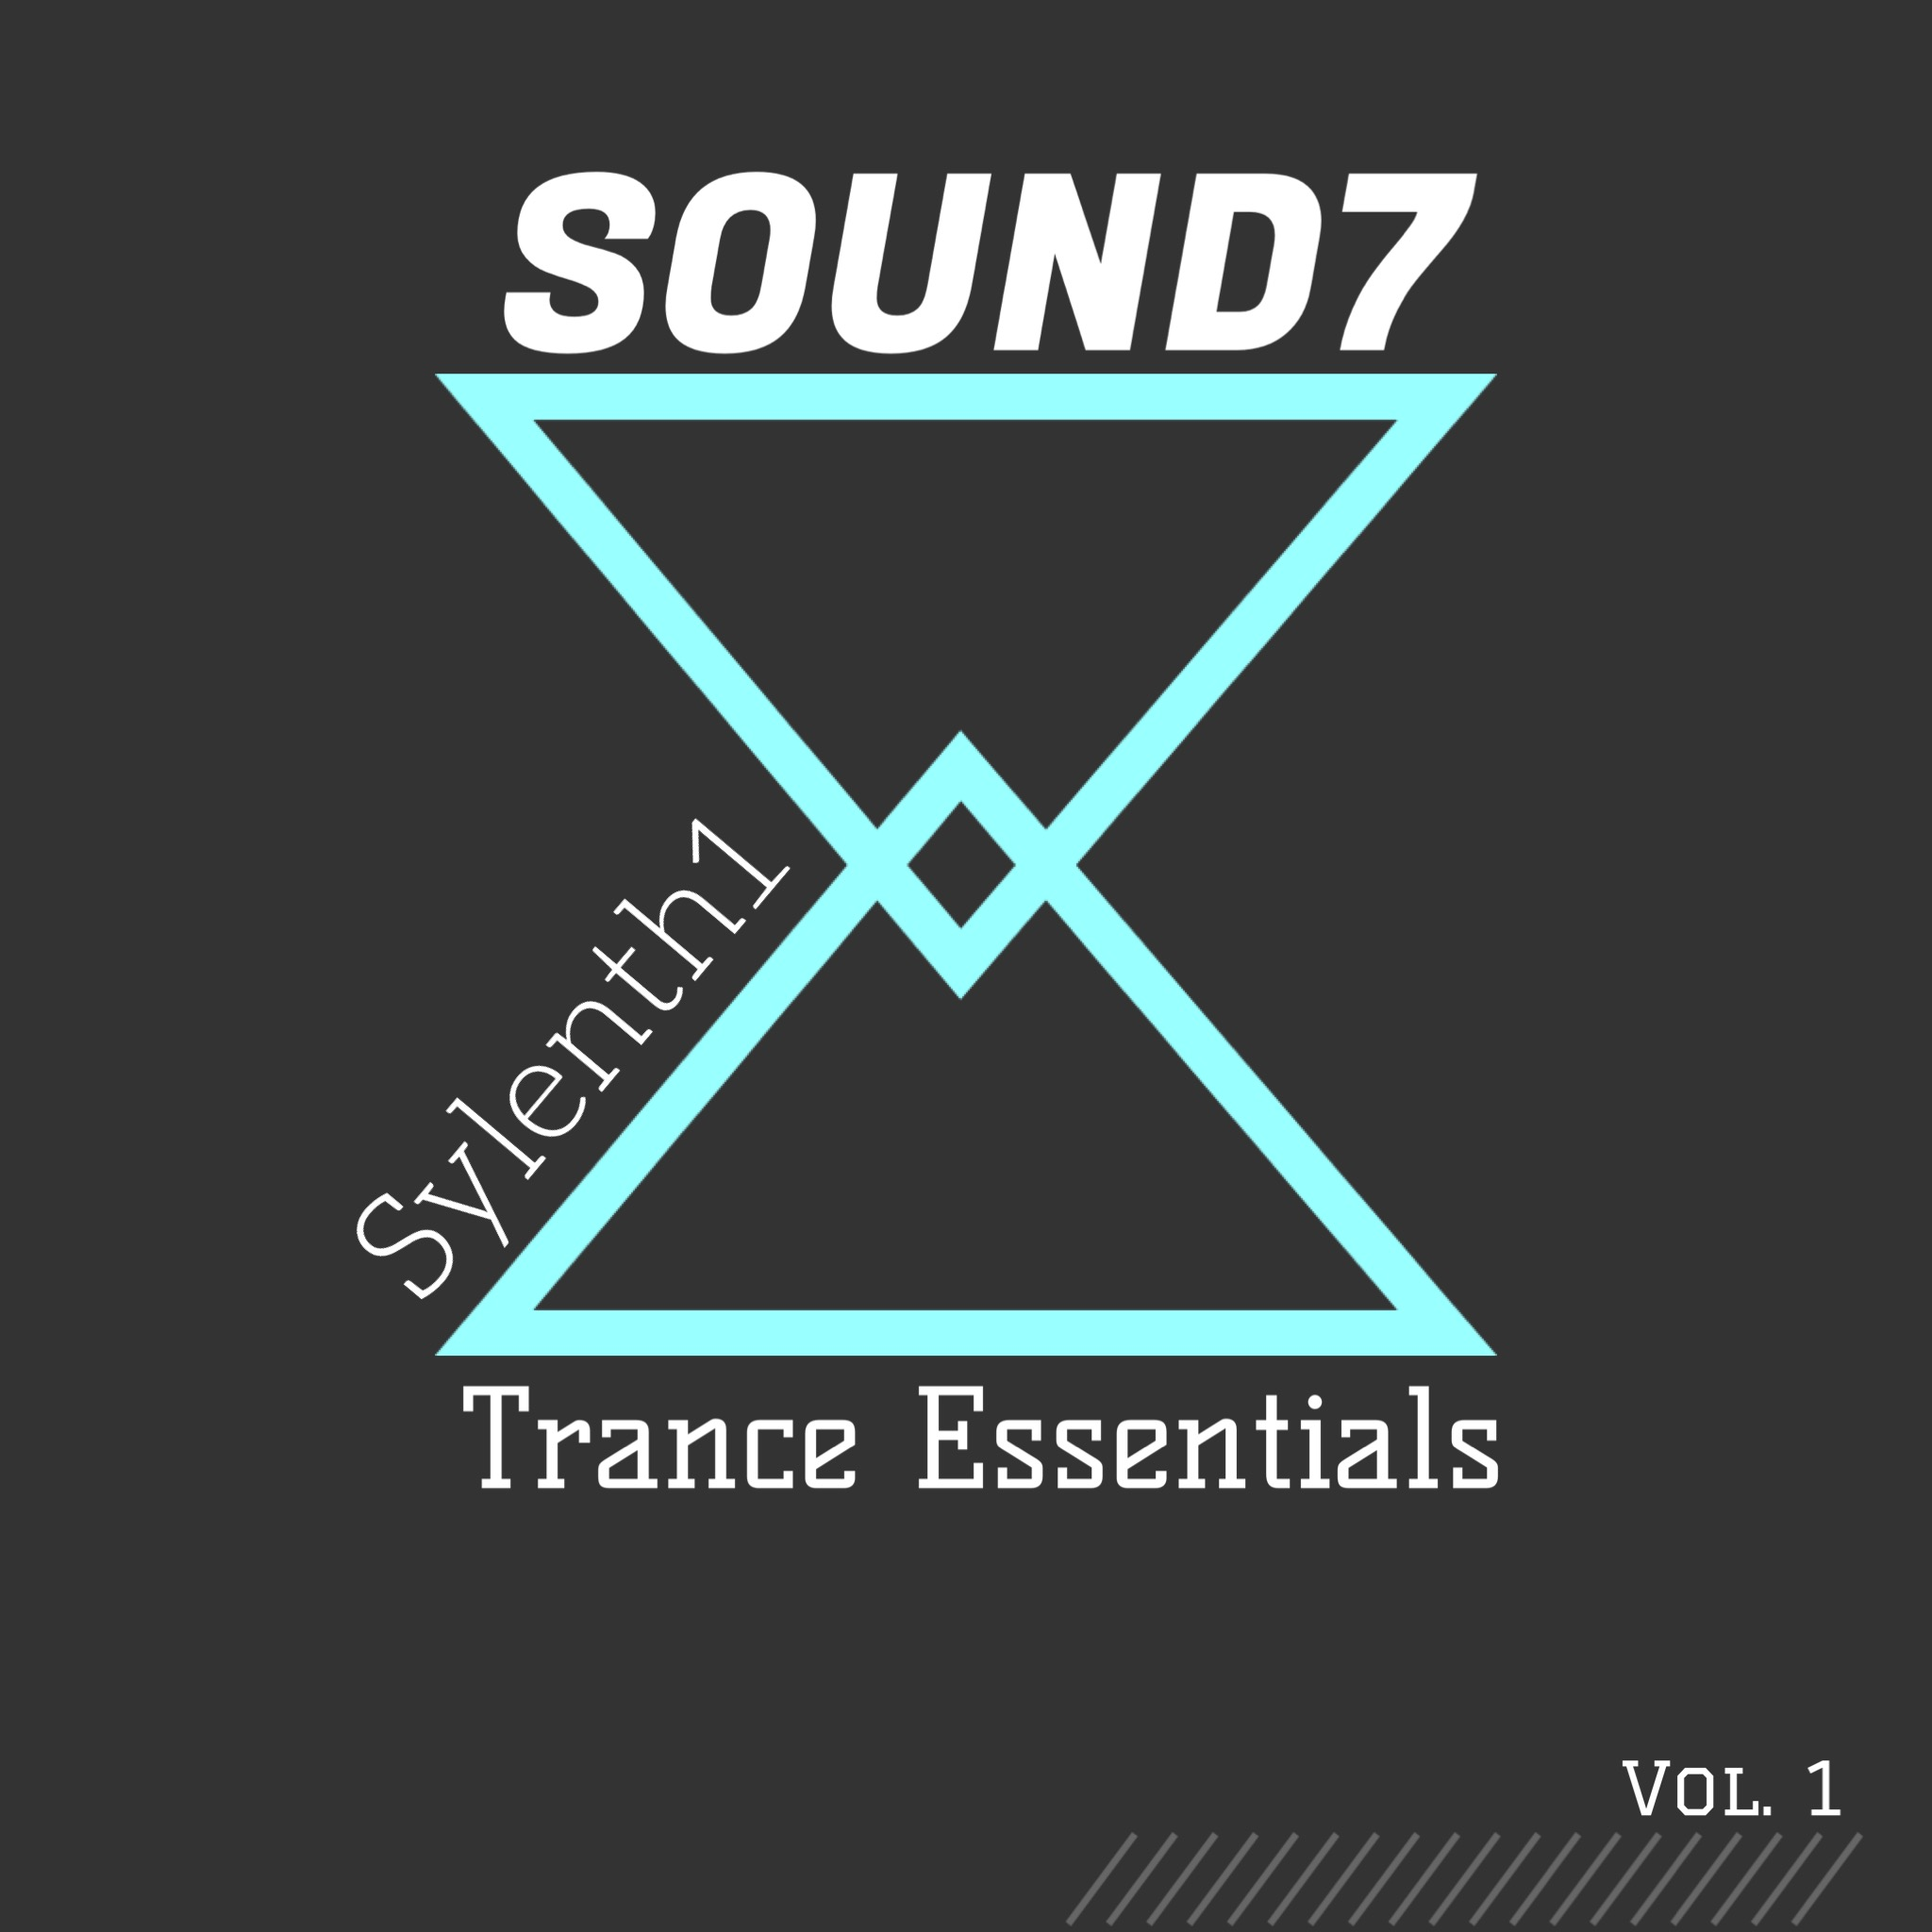 Sylenth1 - Trance Essentials Vol. 1